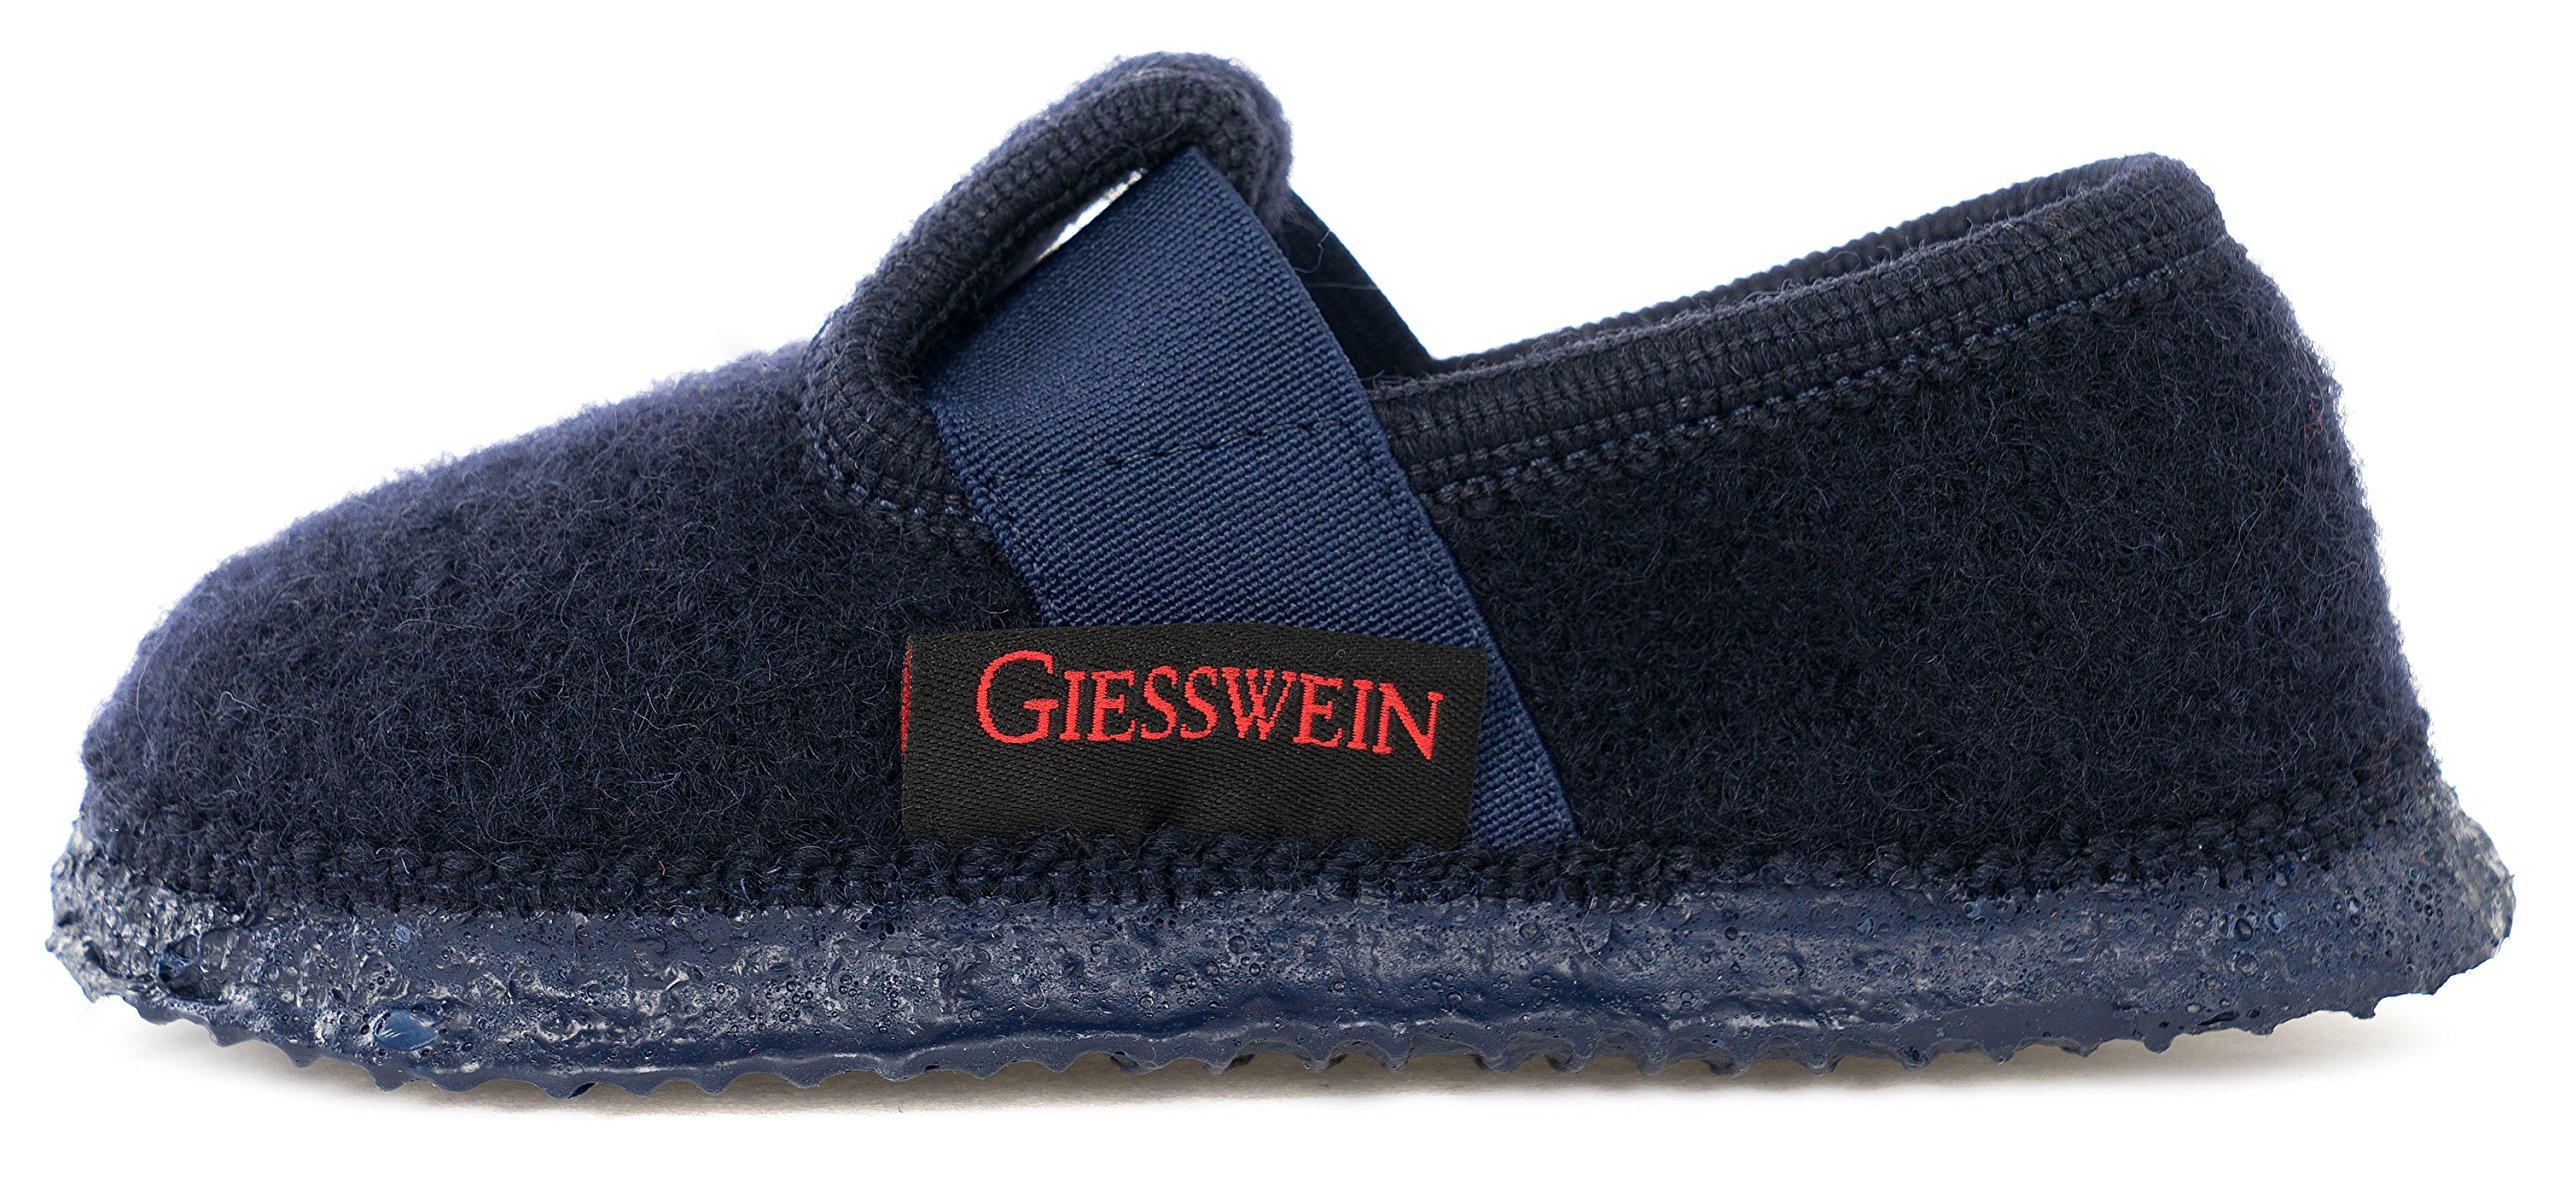 Giesswein Slipper Türnberg by Giesswein (Image #1)